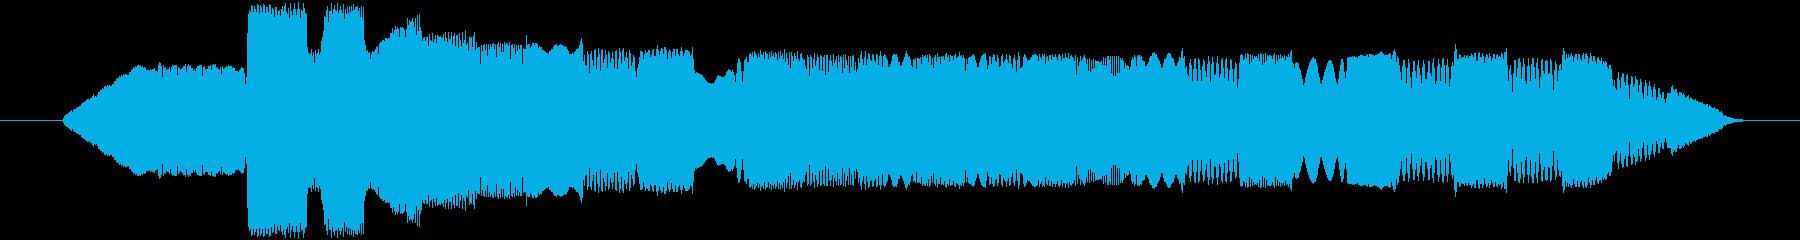 FX Telegraphic Sy...の再生済みの波形